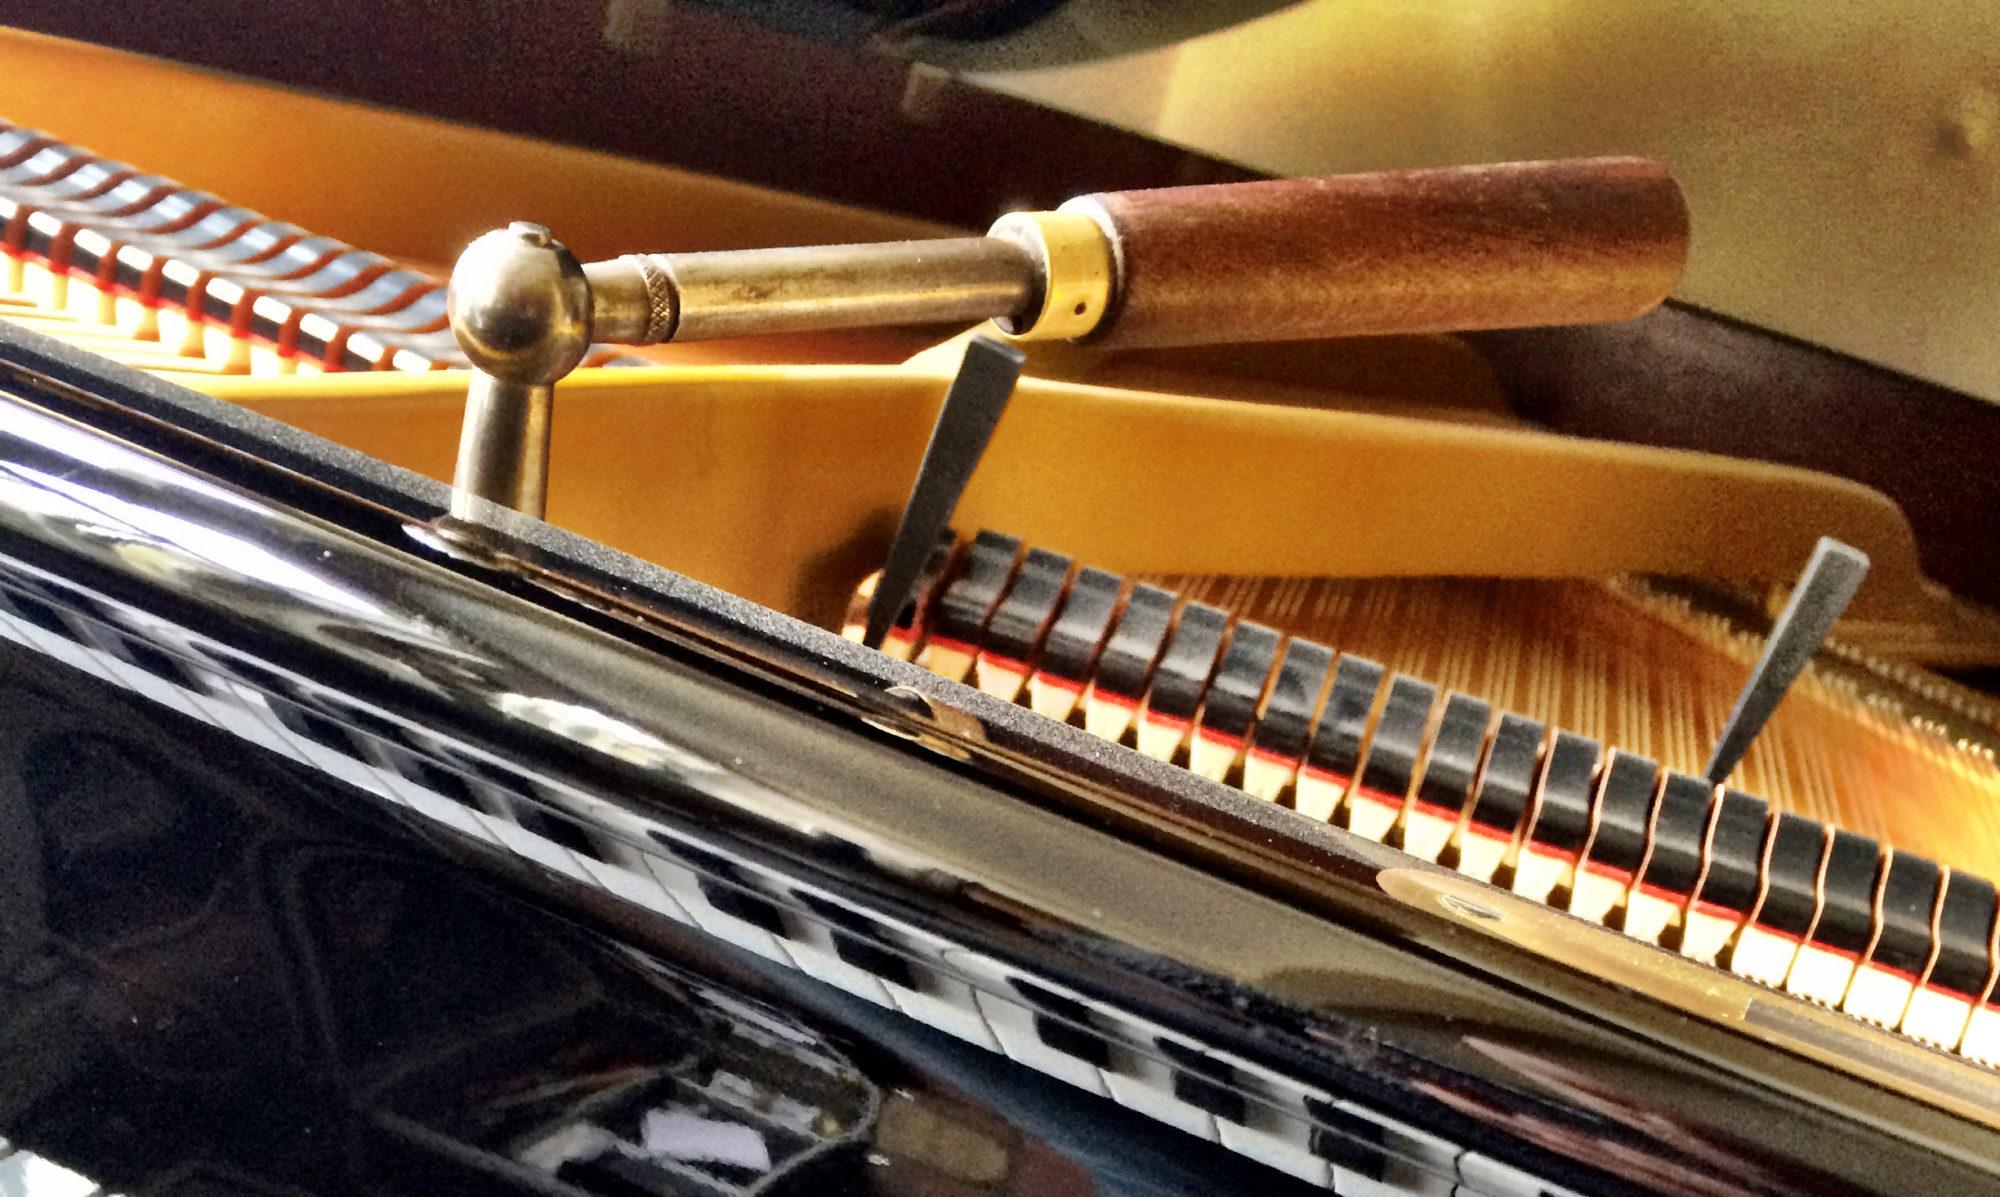 Marcel de Grijs Pianoservice